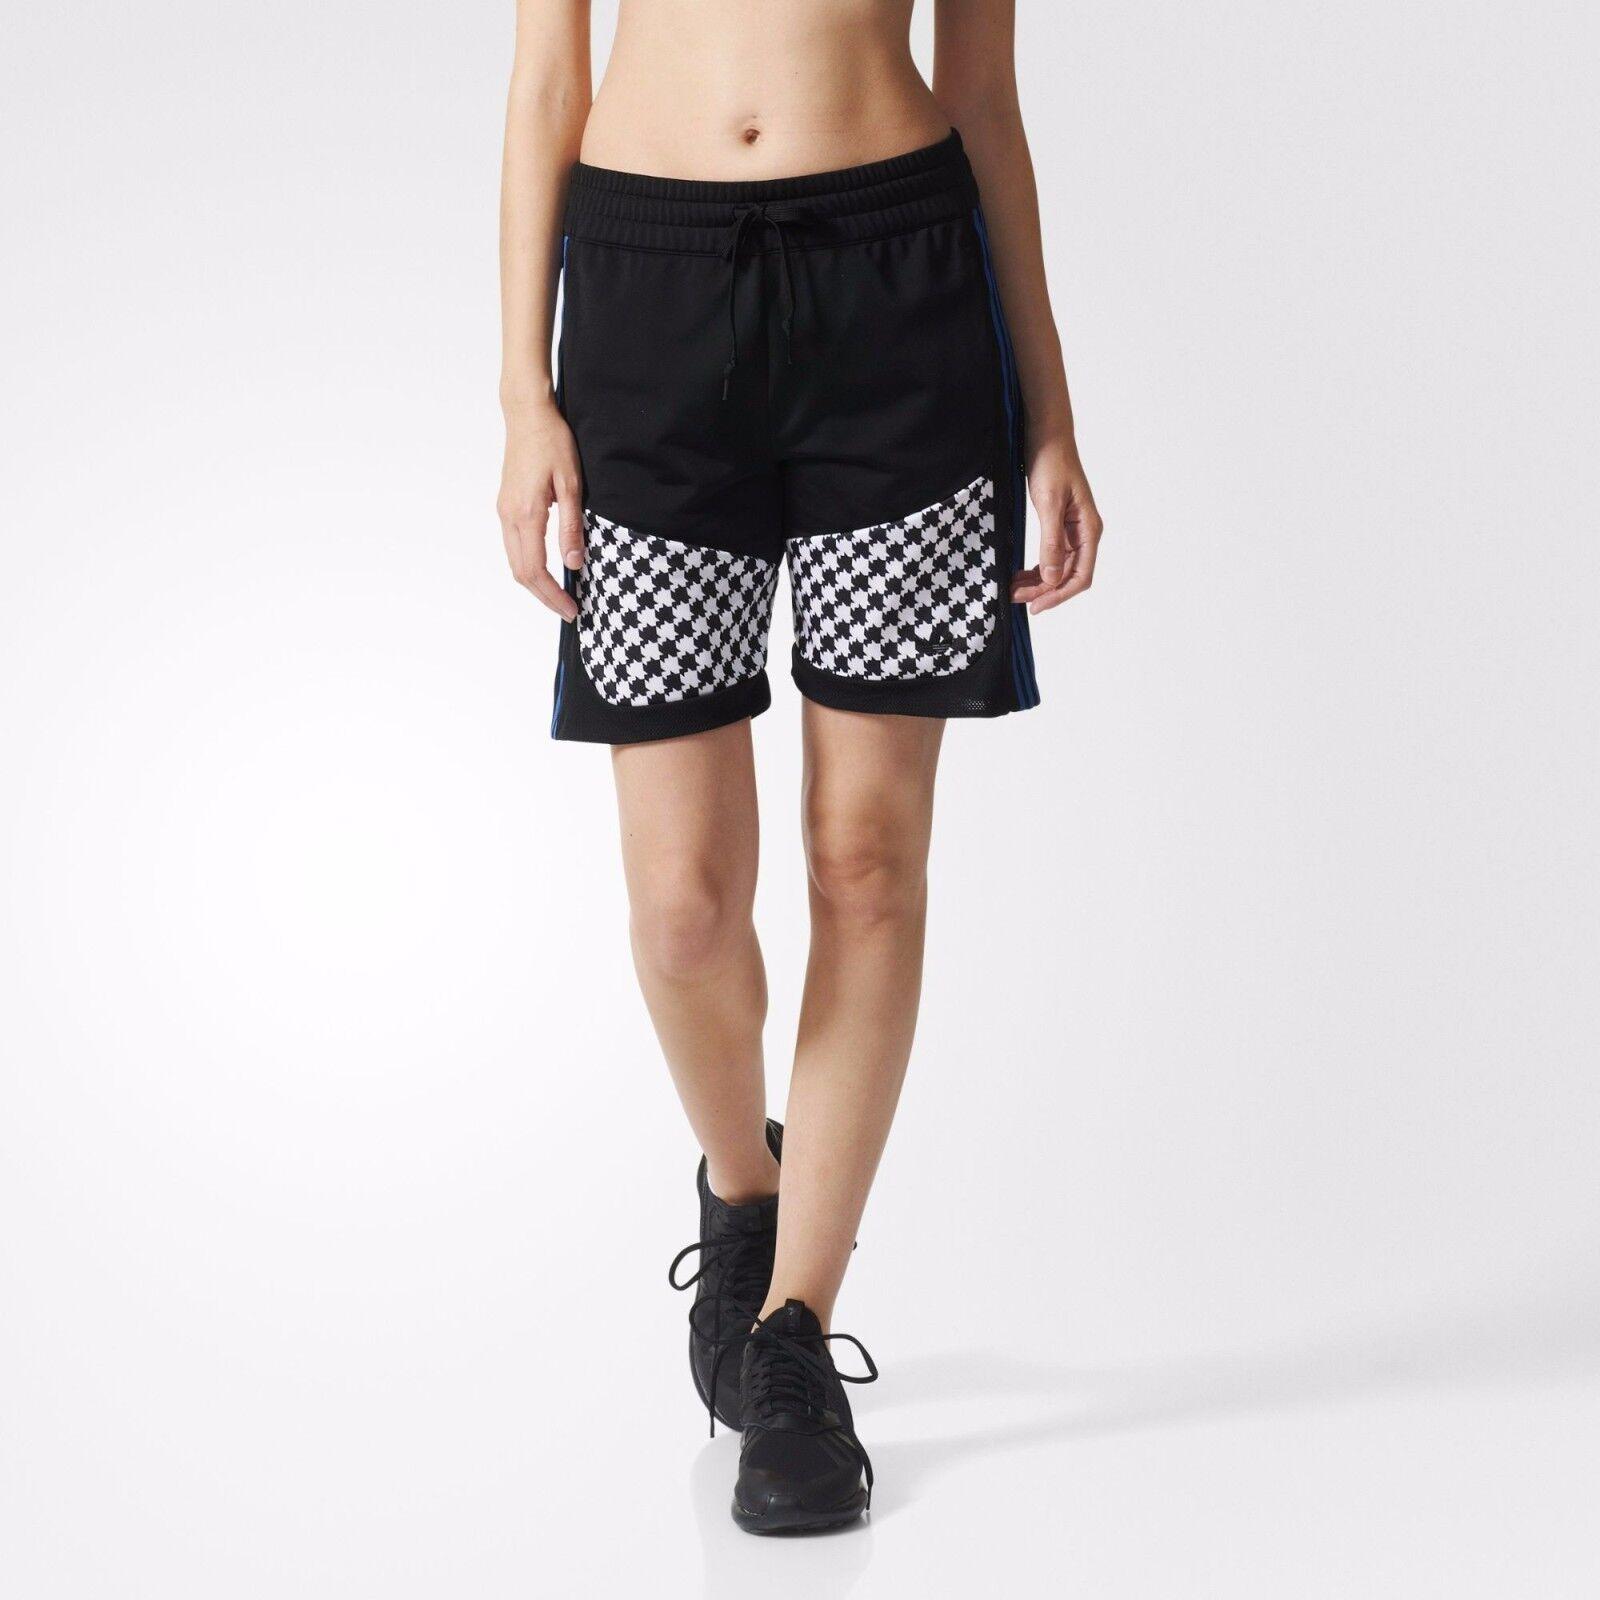 a8e650f305ad Womens adidas Originals Soccer Shorts in Black-ribbed Waist-external 6  AJ8602BLK163